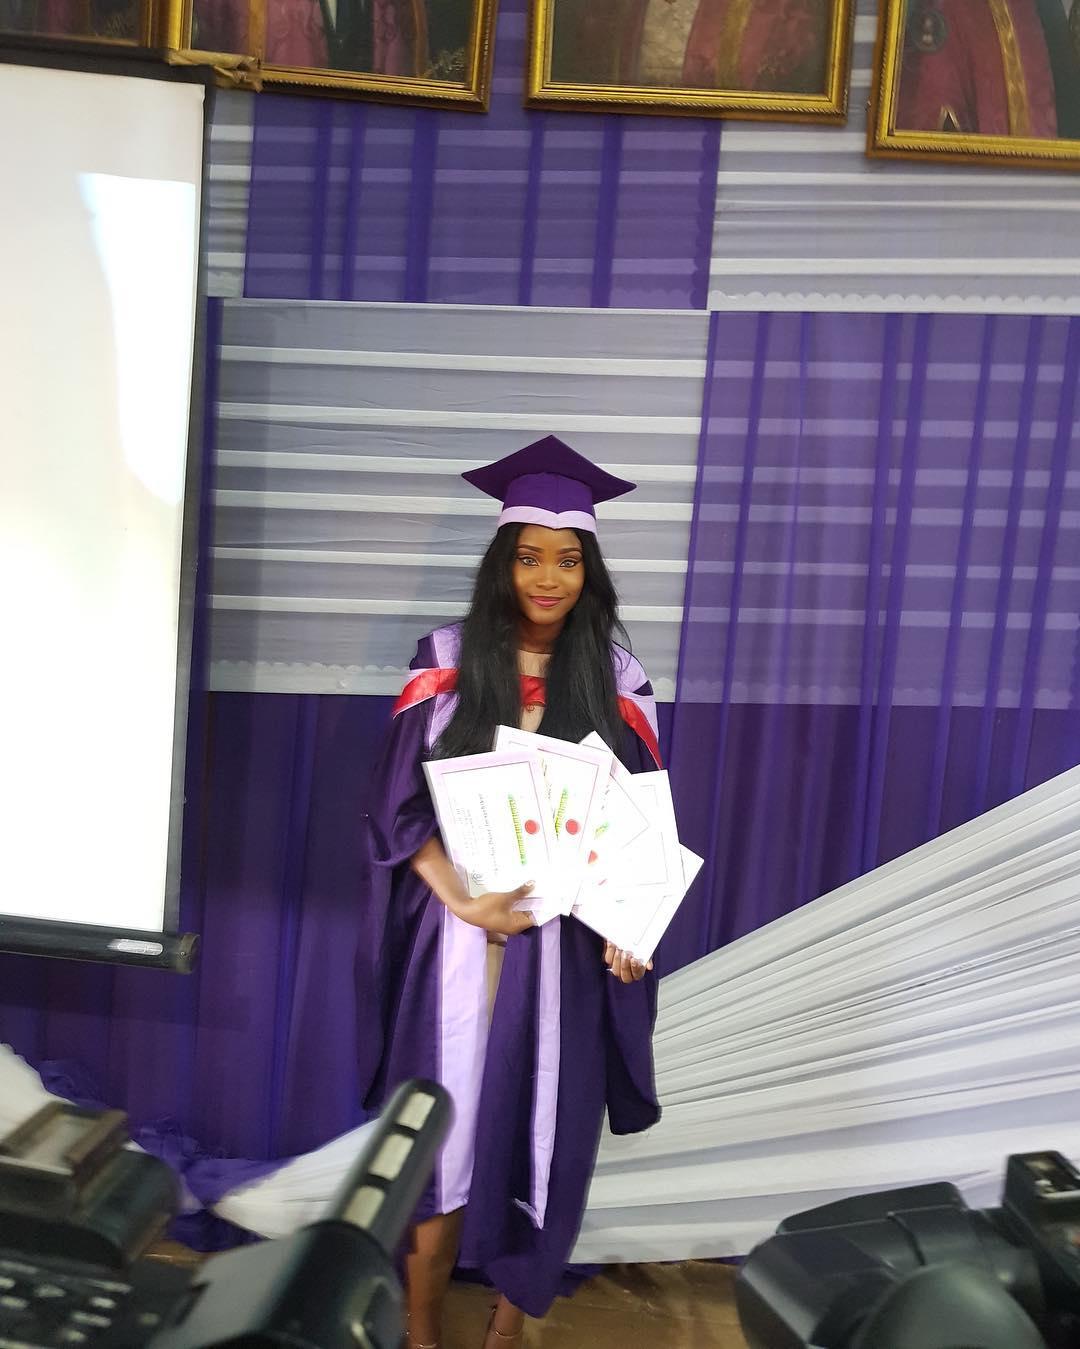 Uniben medical graduate, Daisy Okonofua